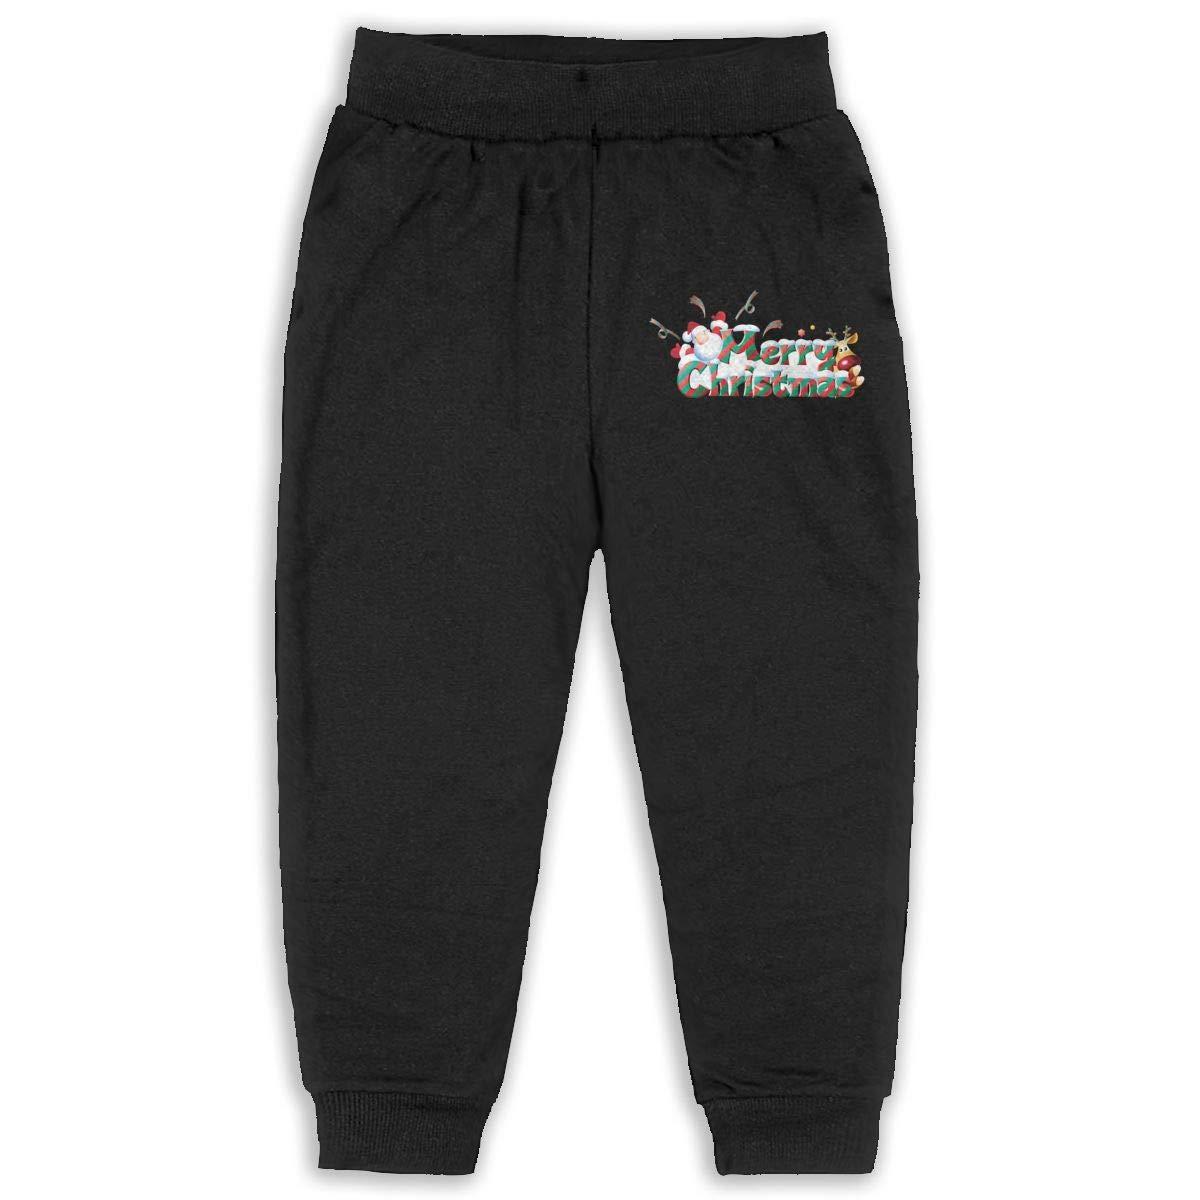 JOAPNWJ Merry Christmas Children Cartoon Cotton Sweatpants Sport Jogger Elastic Pants